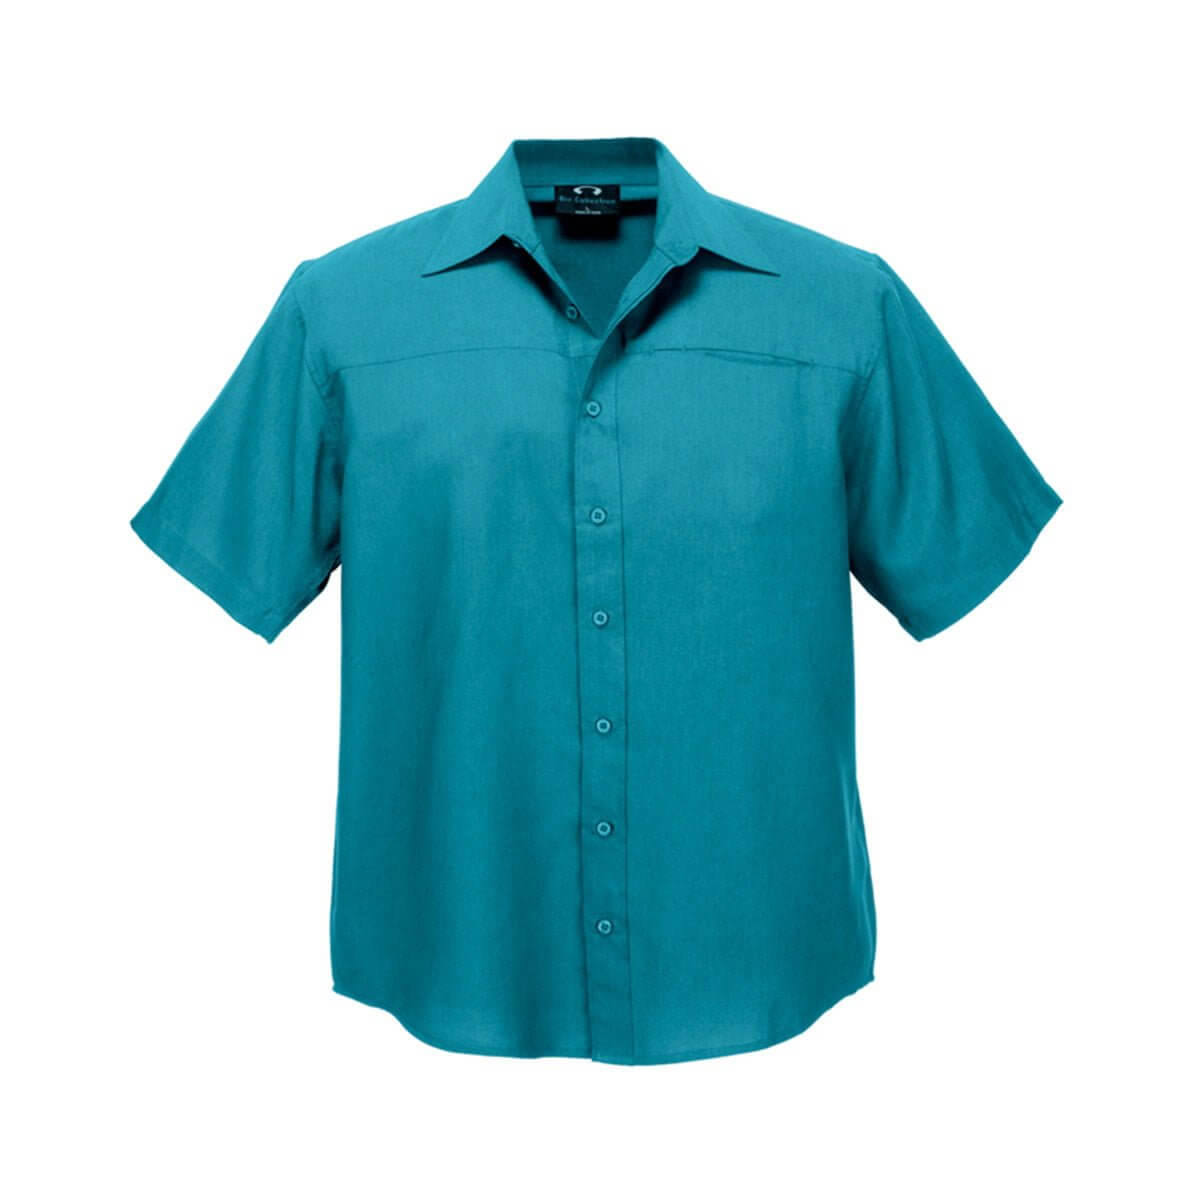 Mens Plain Oasis Short Sleeve Shirt-Teal